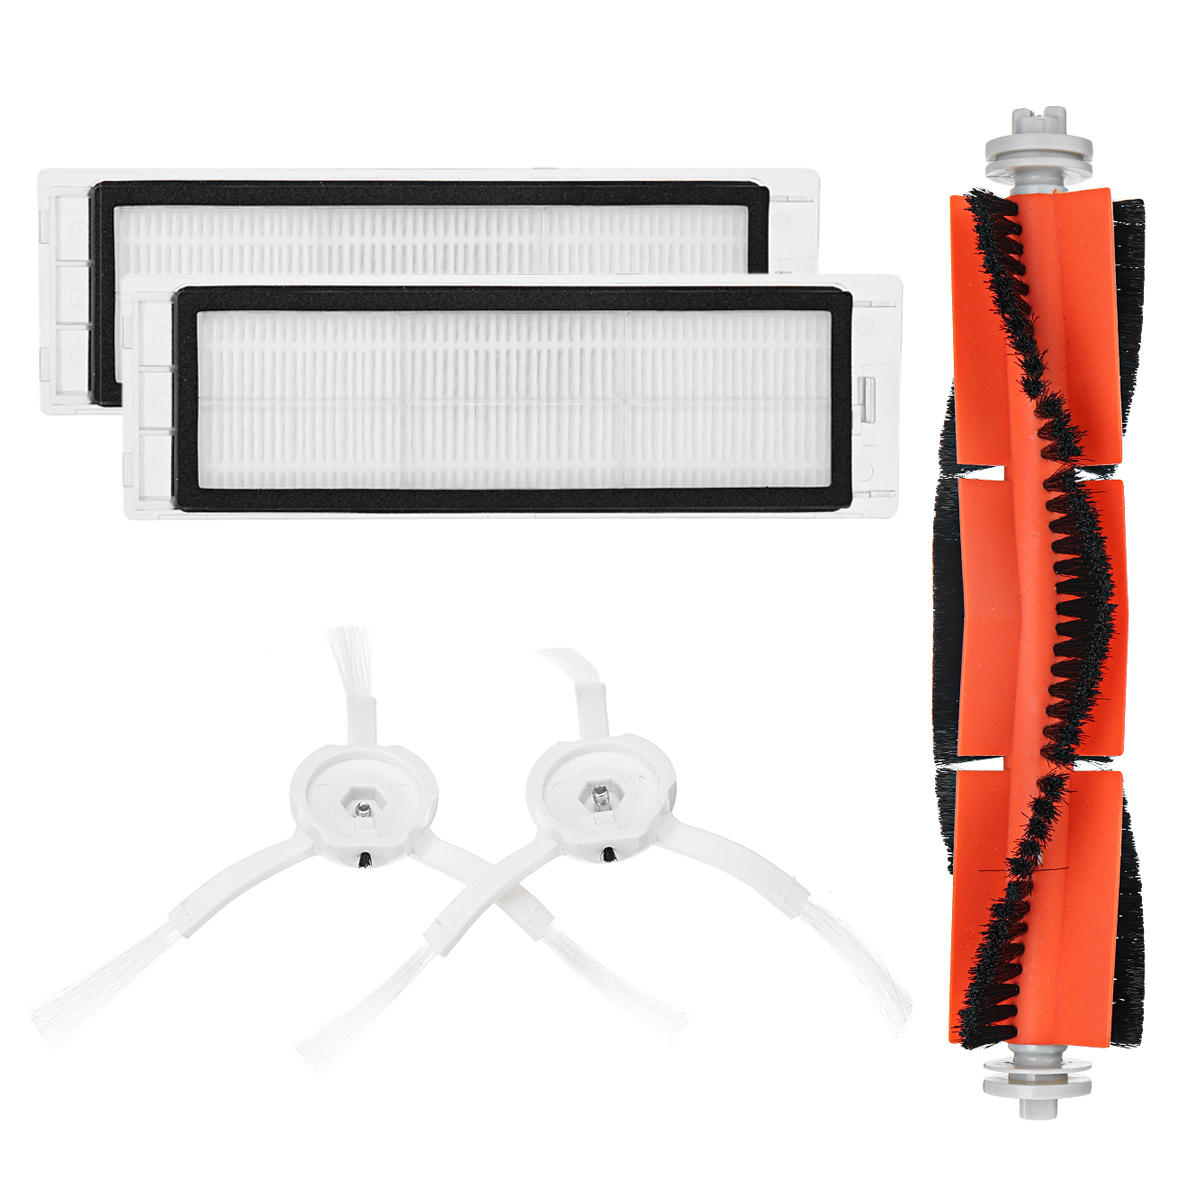 Main Brush Filters Side Brushes Accessories For XIAOMI MI Robot Roborock S5 S6 Vacuum Home Applicance Part Non-original